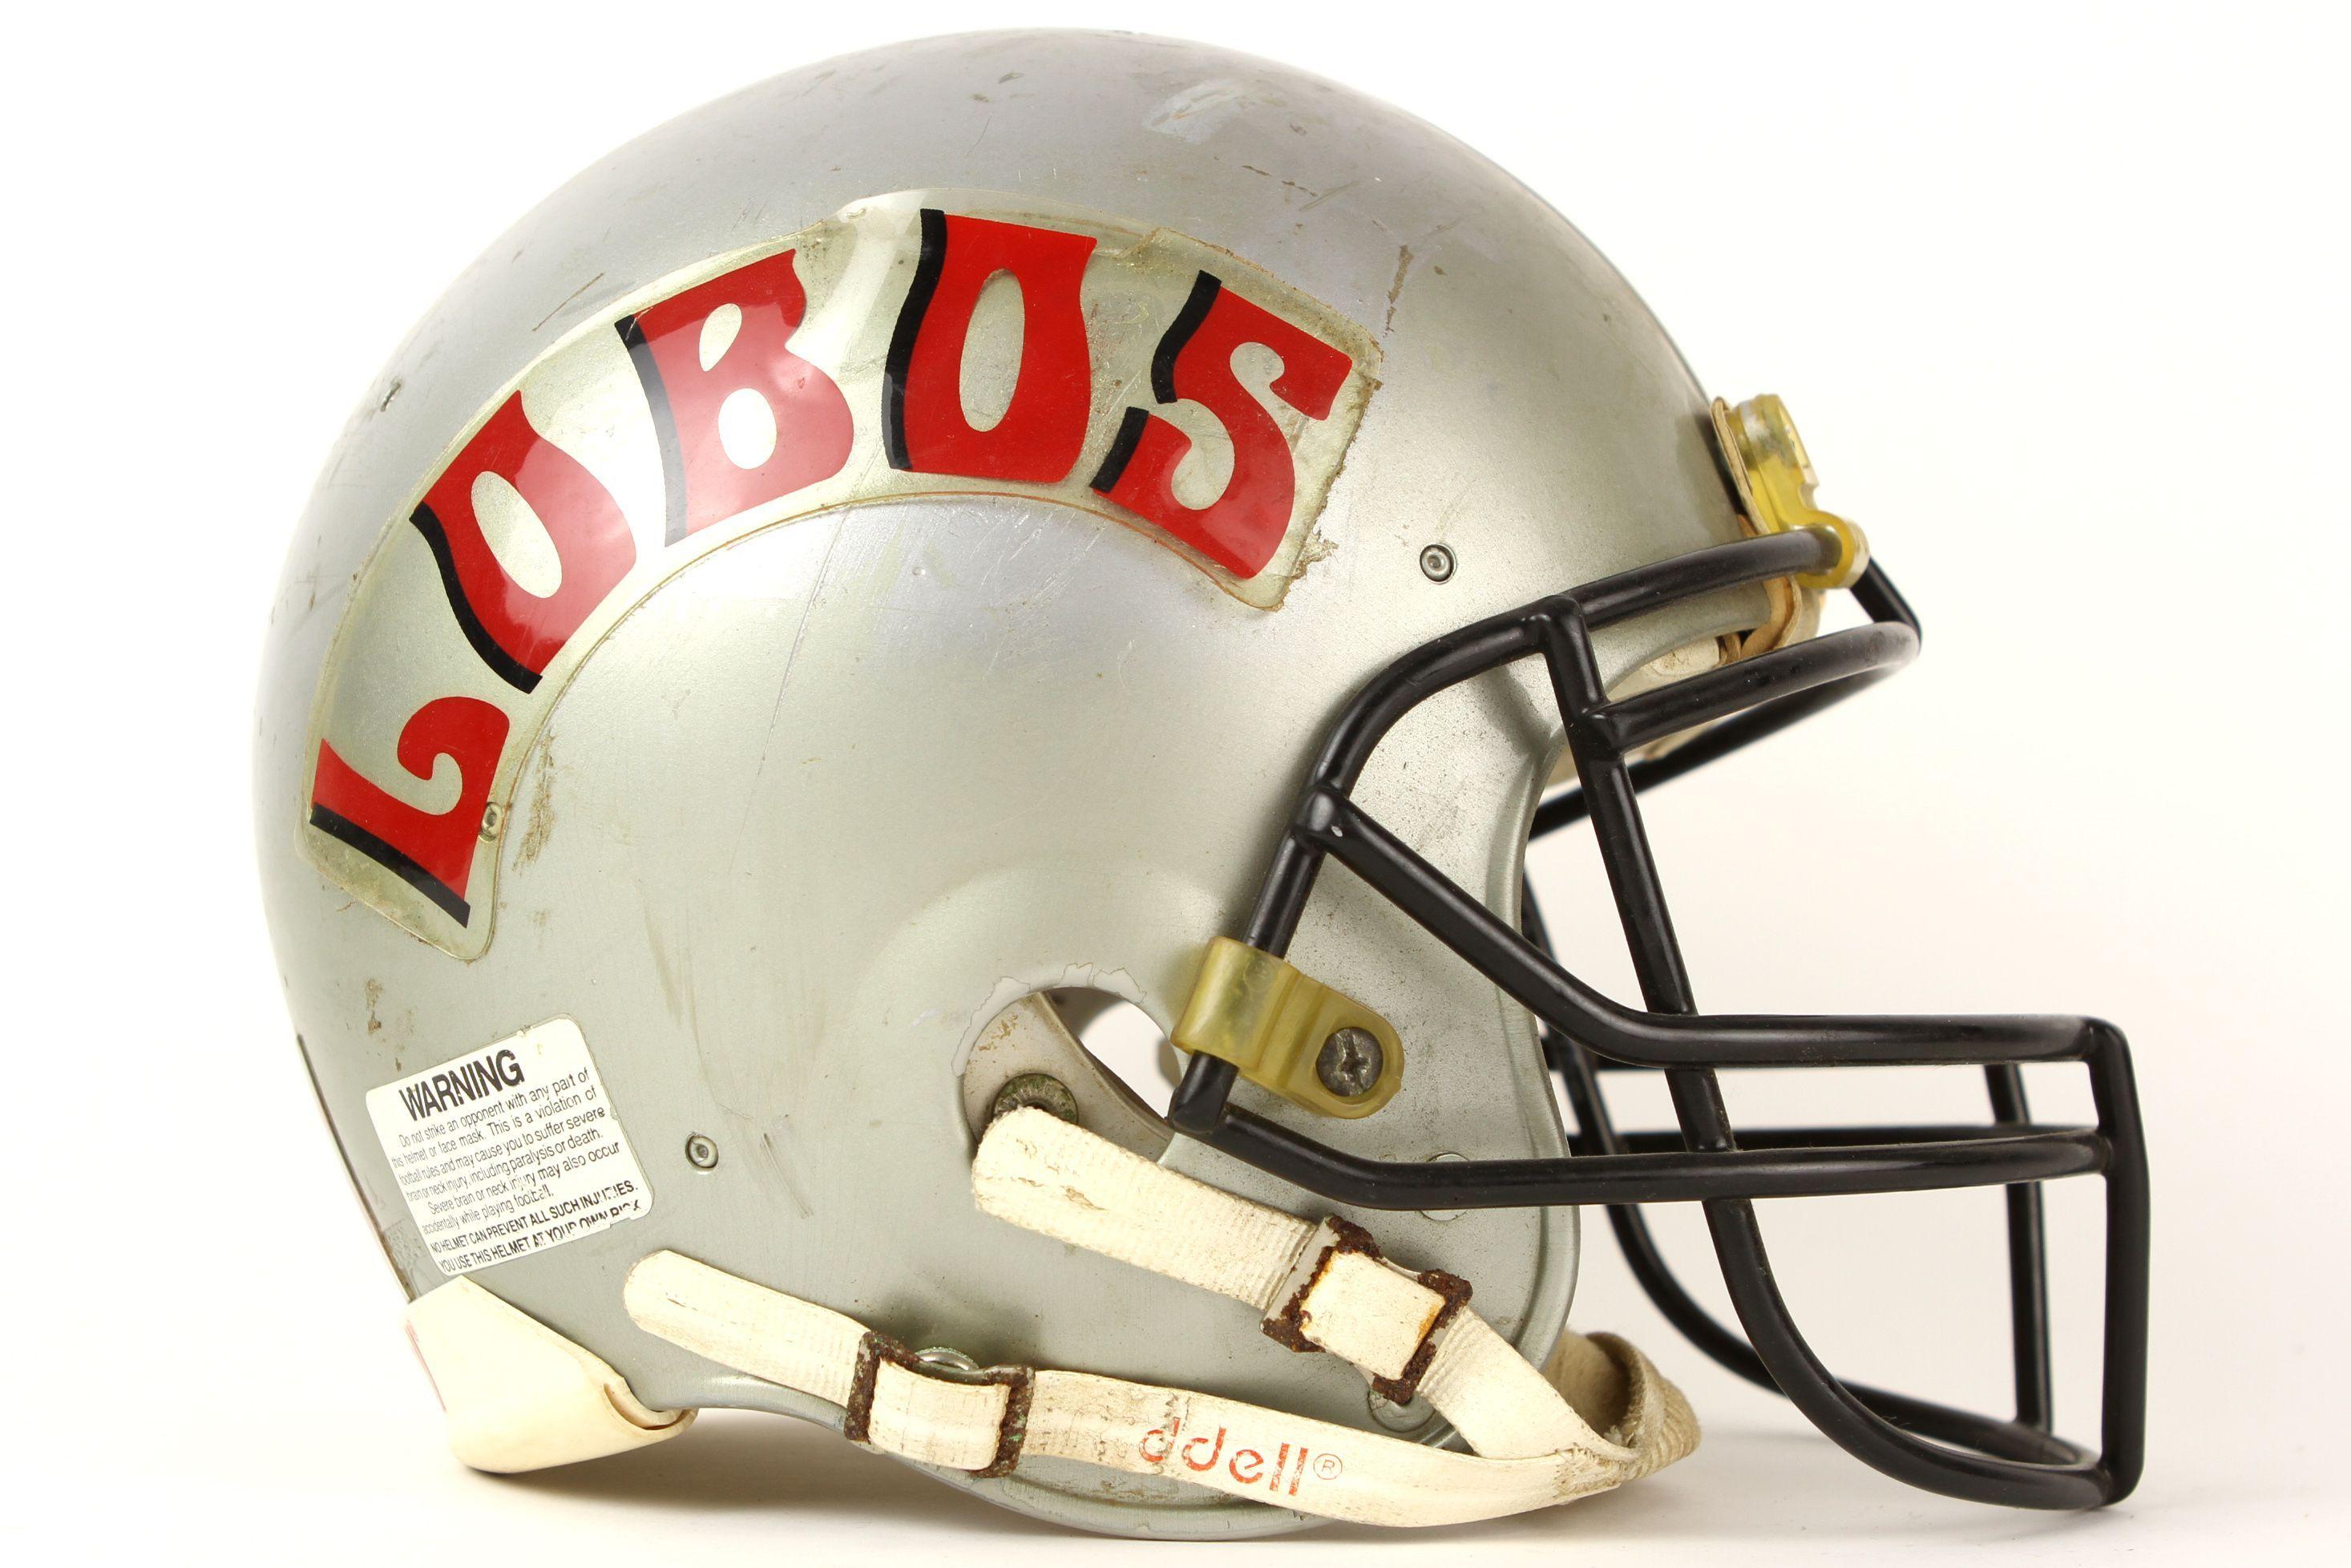 Football helmet blowjob — 14